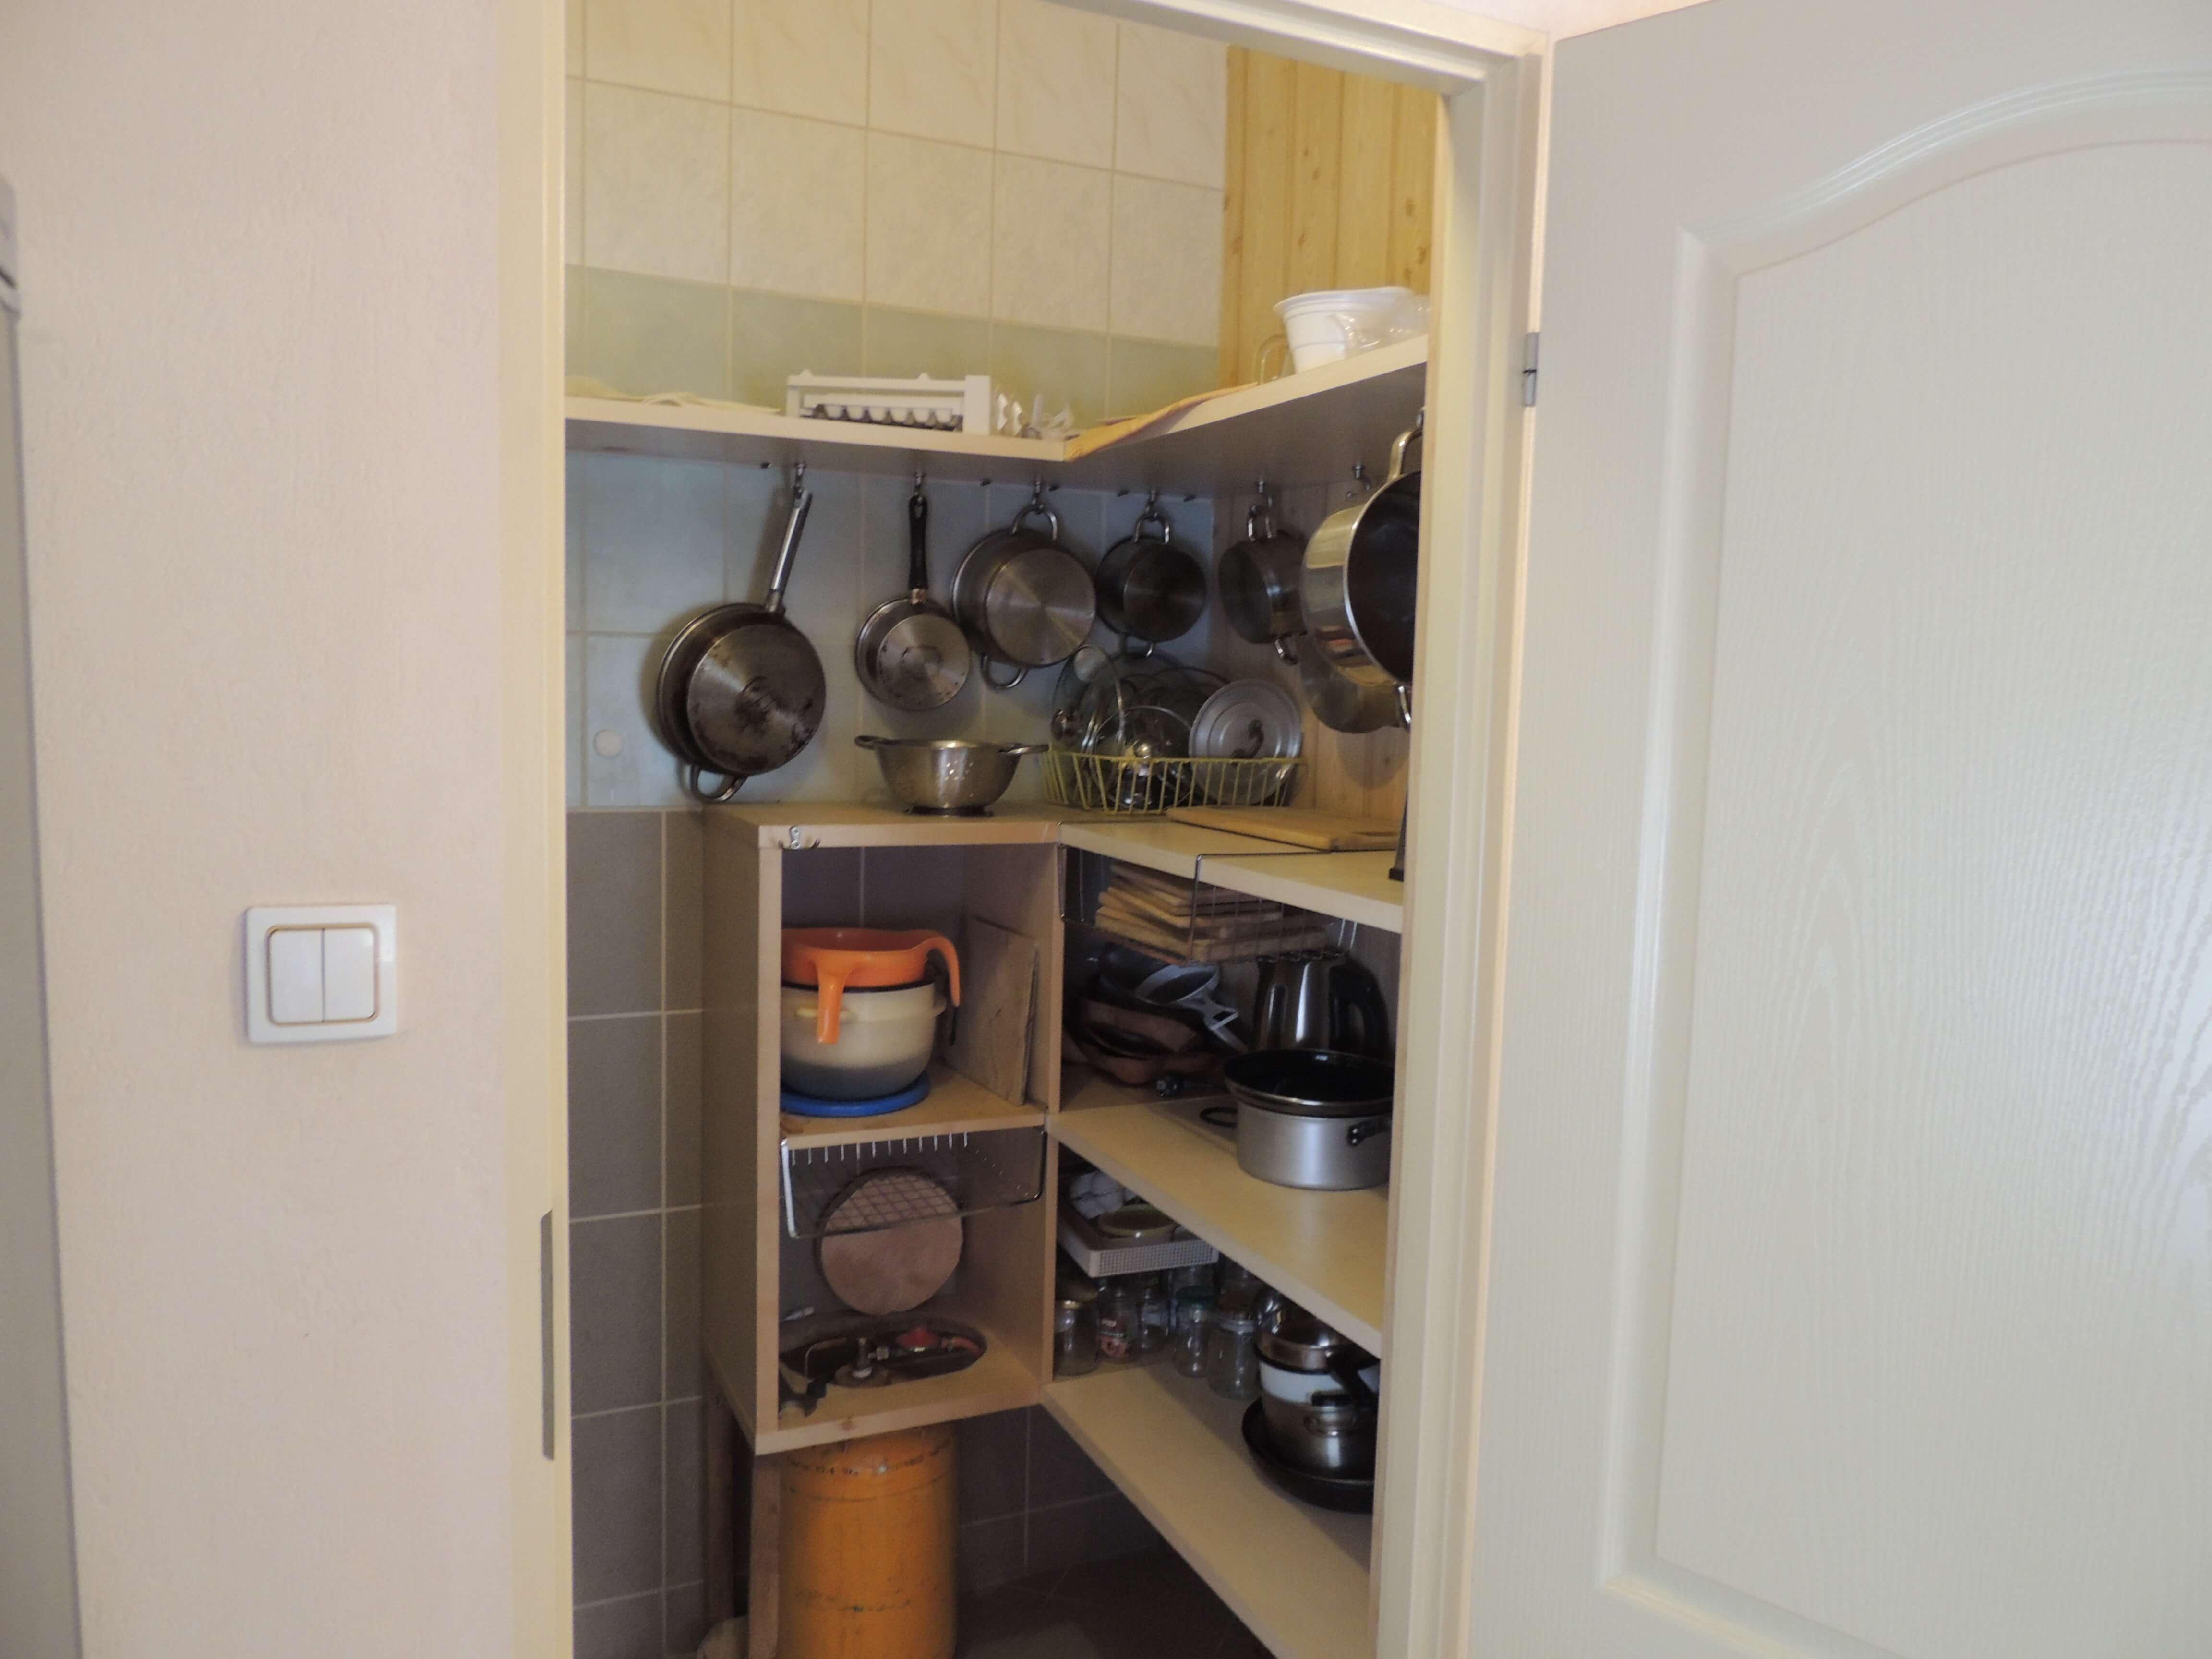 wyposażona kuchnia - garnki, patelnie itp.